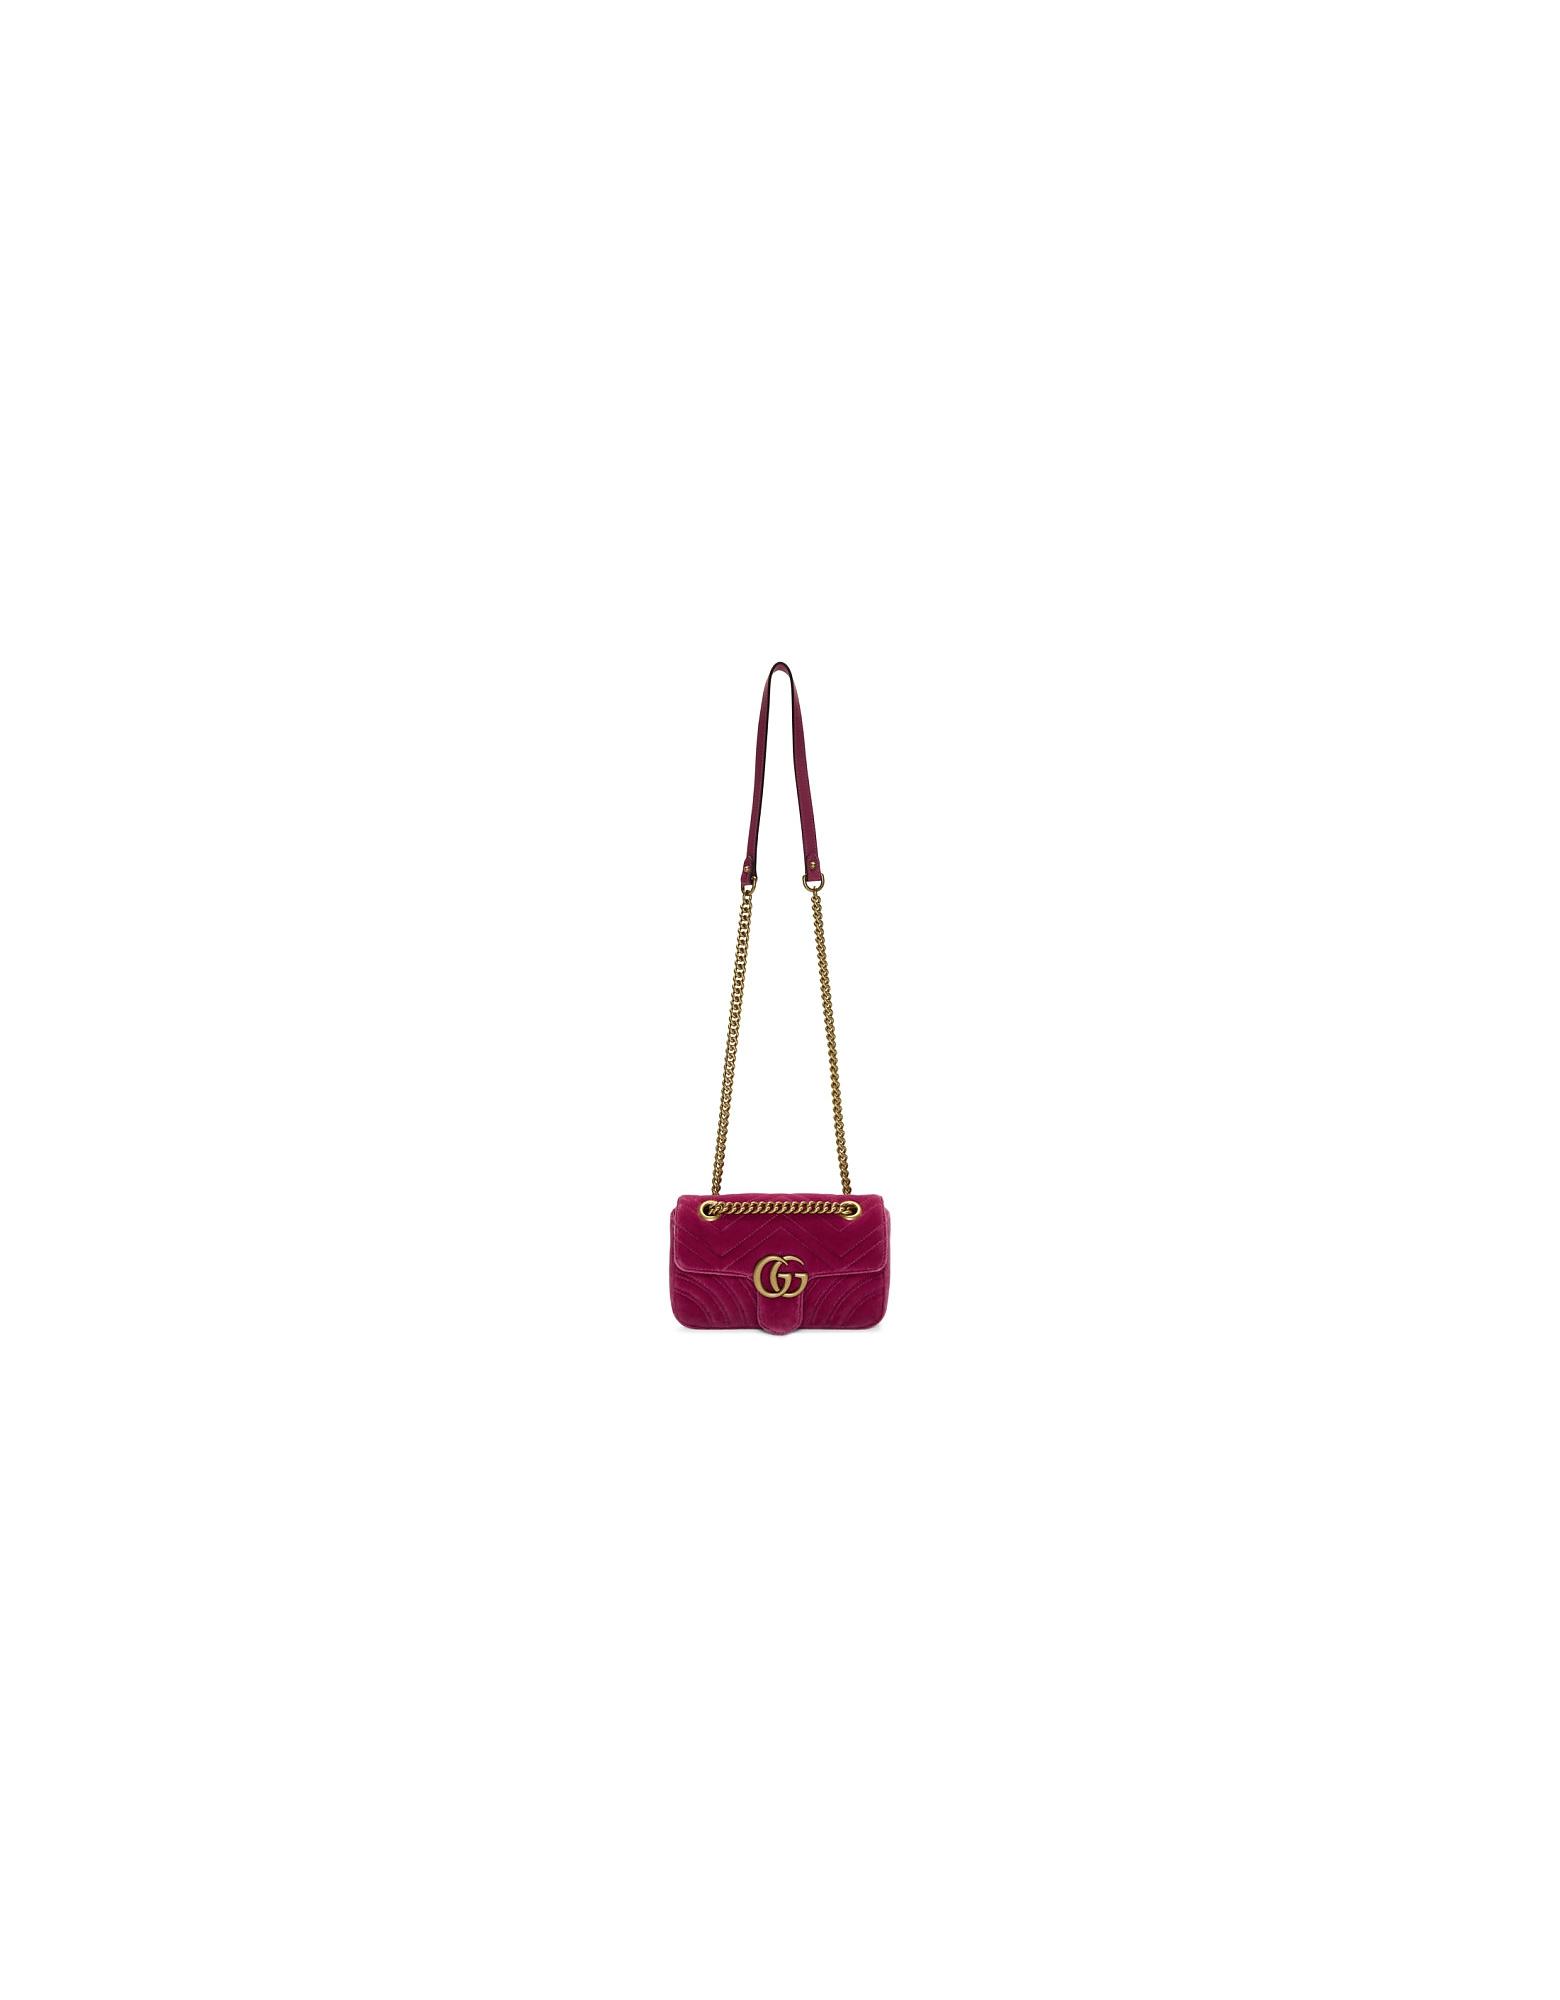 Gucci Designer Handbags, Pink Mini Velvet Marmont 2.0 Bag